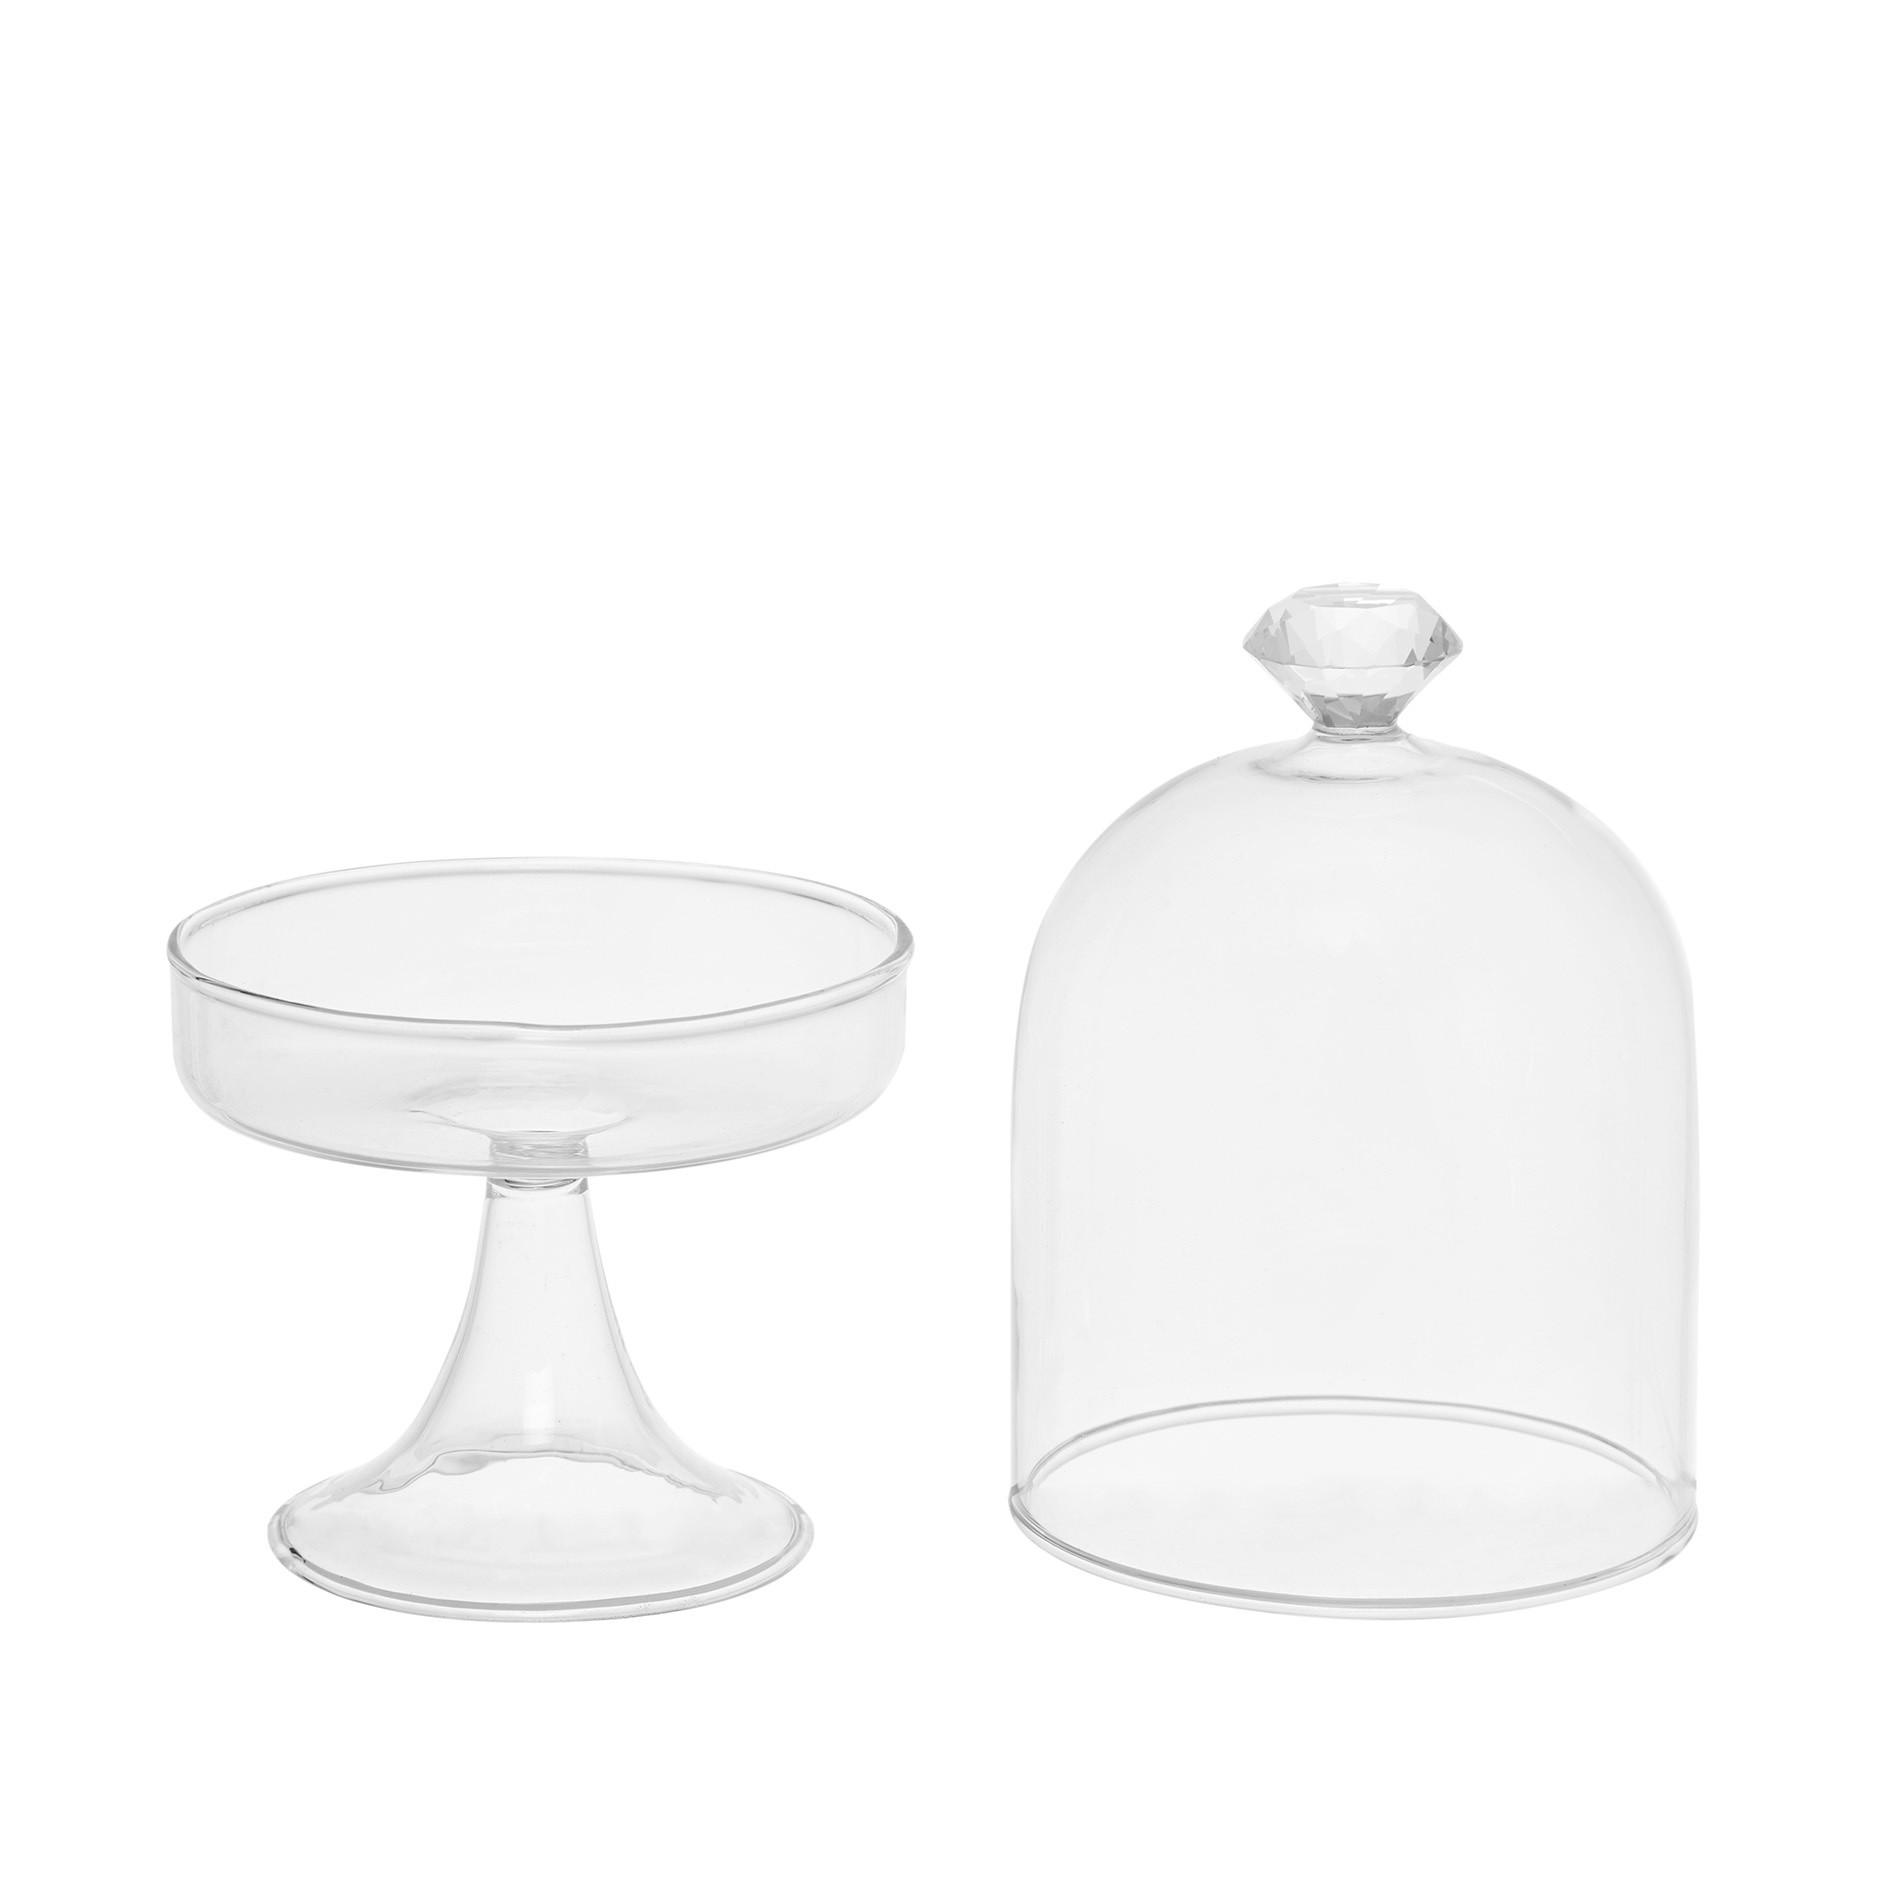 Alzata vetro con diamante, Bianco, large image number 1